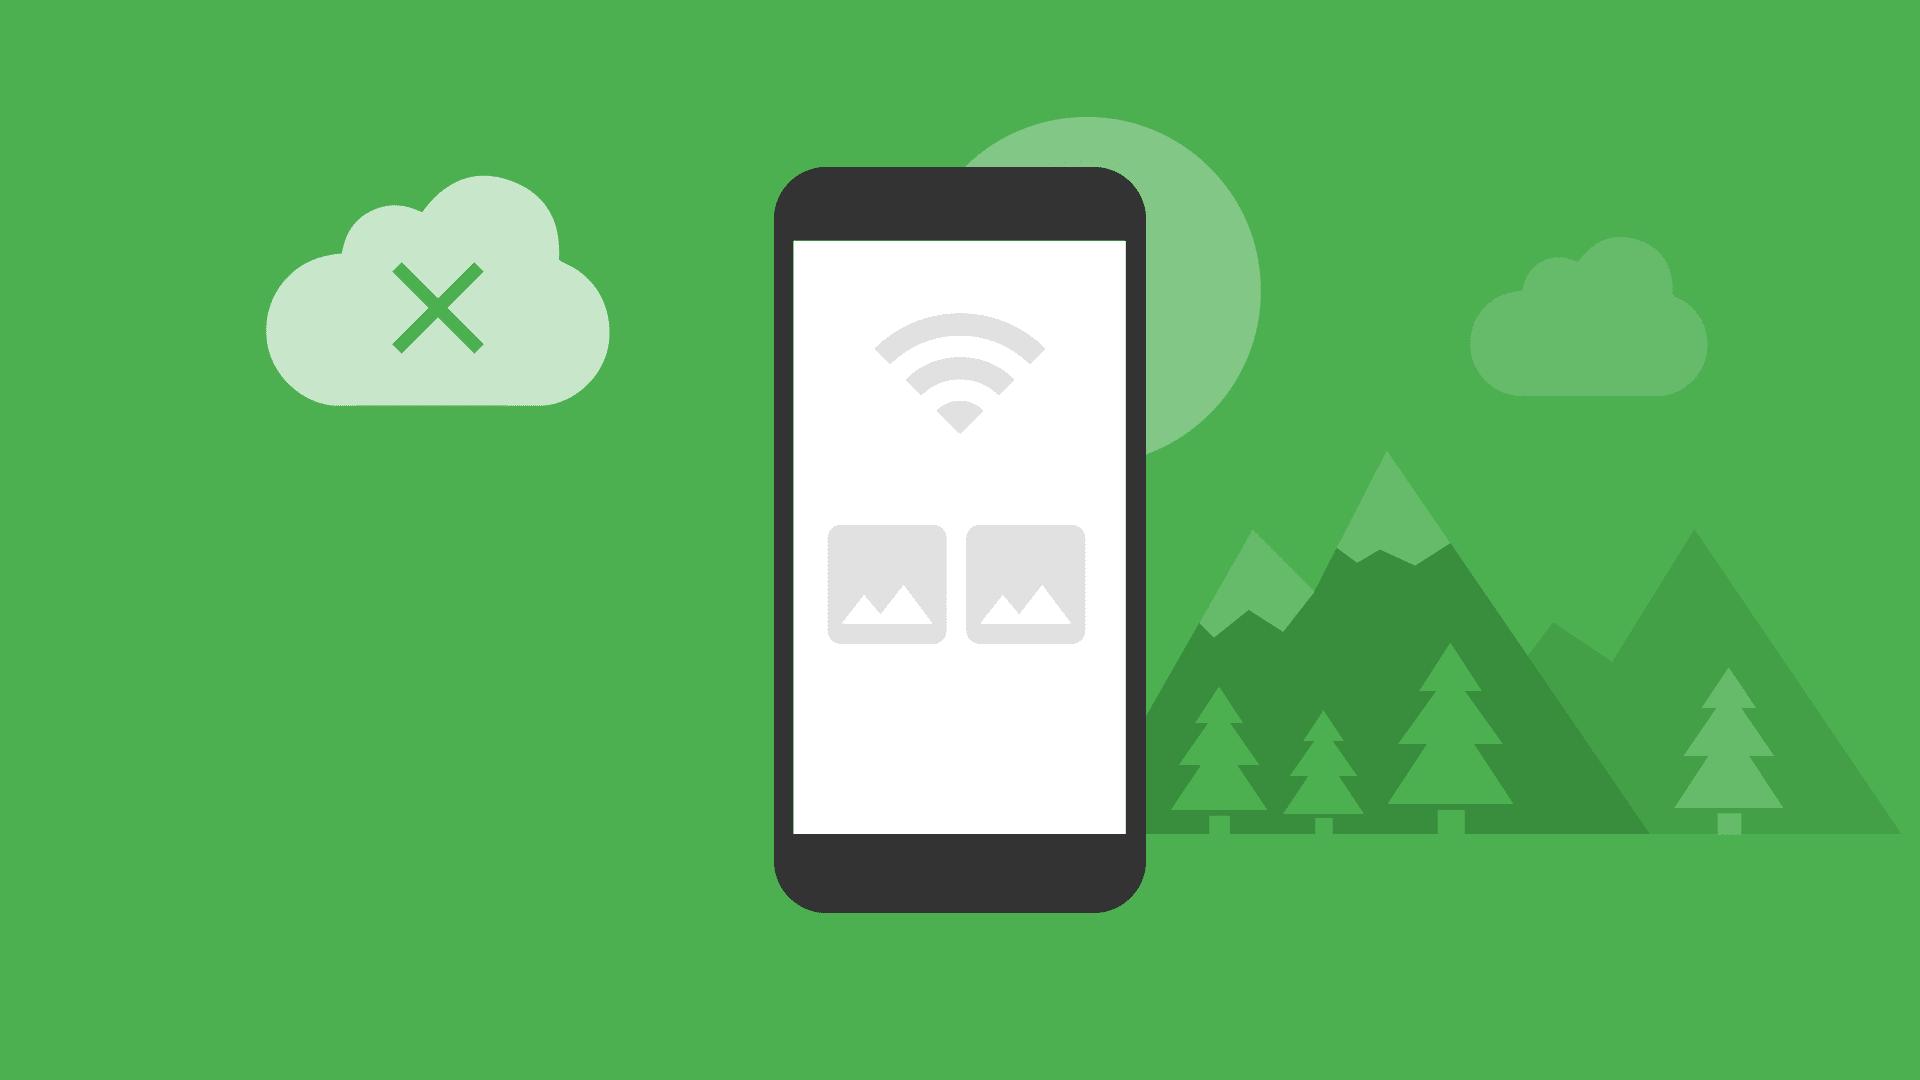 Telefonbildschirm mit Offline-Status